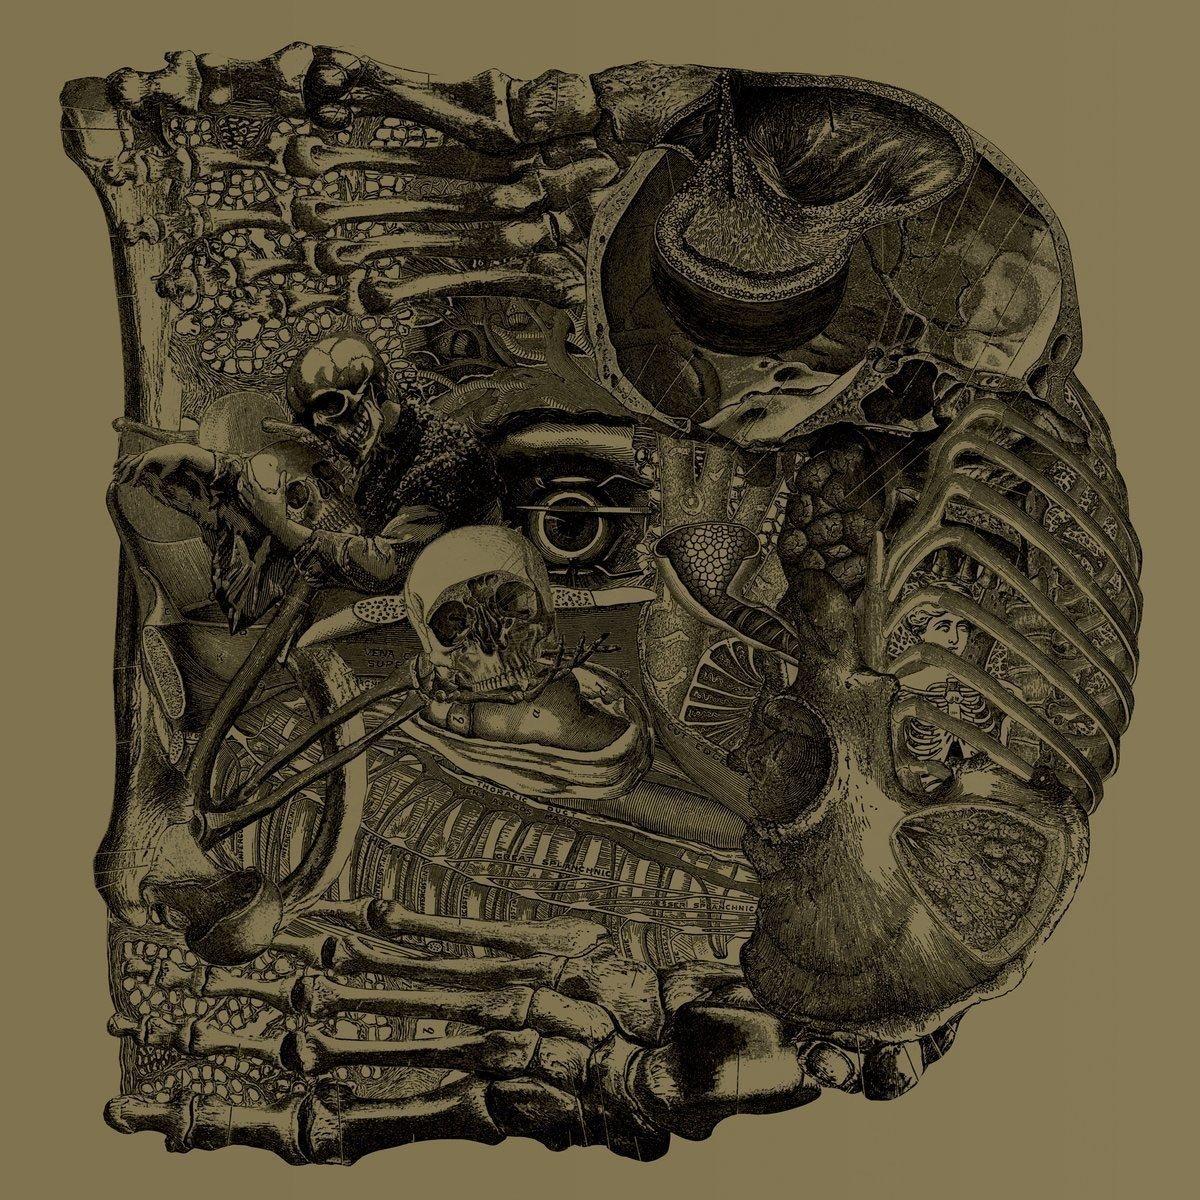 Vinilo : Boris - Dear (Gatefold LP Jacket, Digital Download Card)